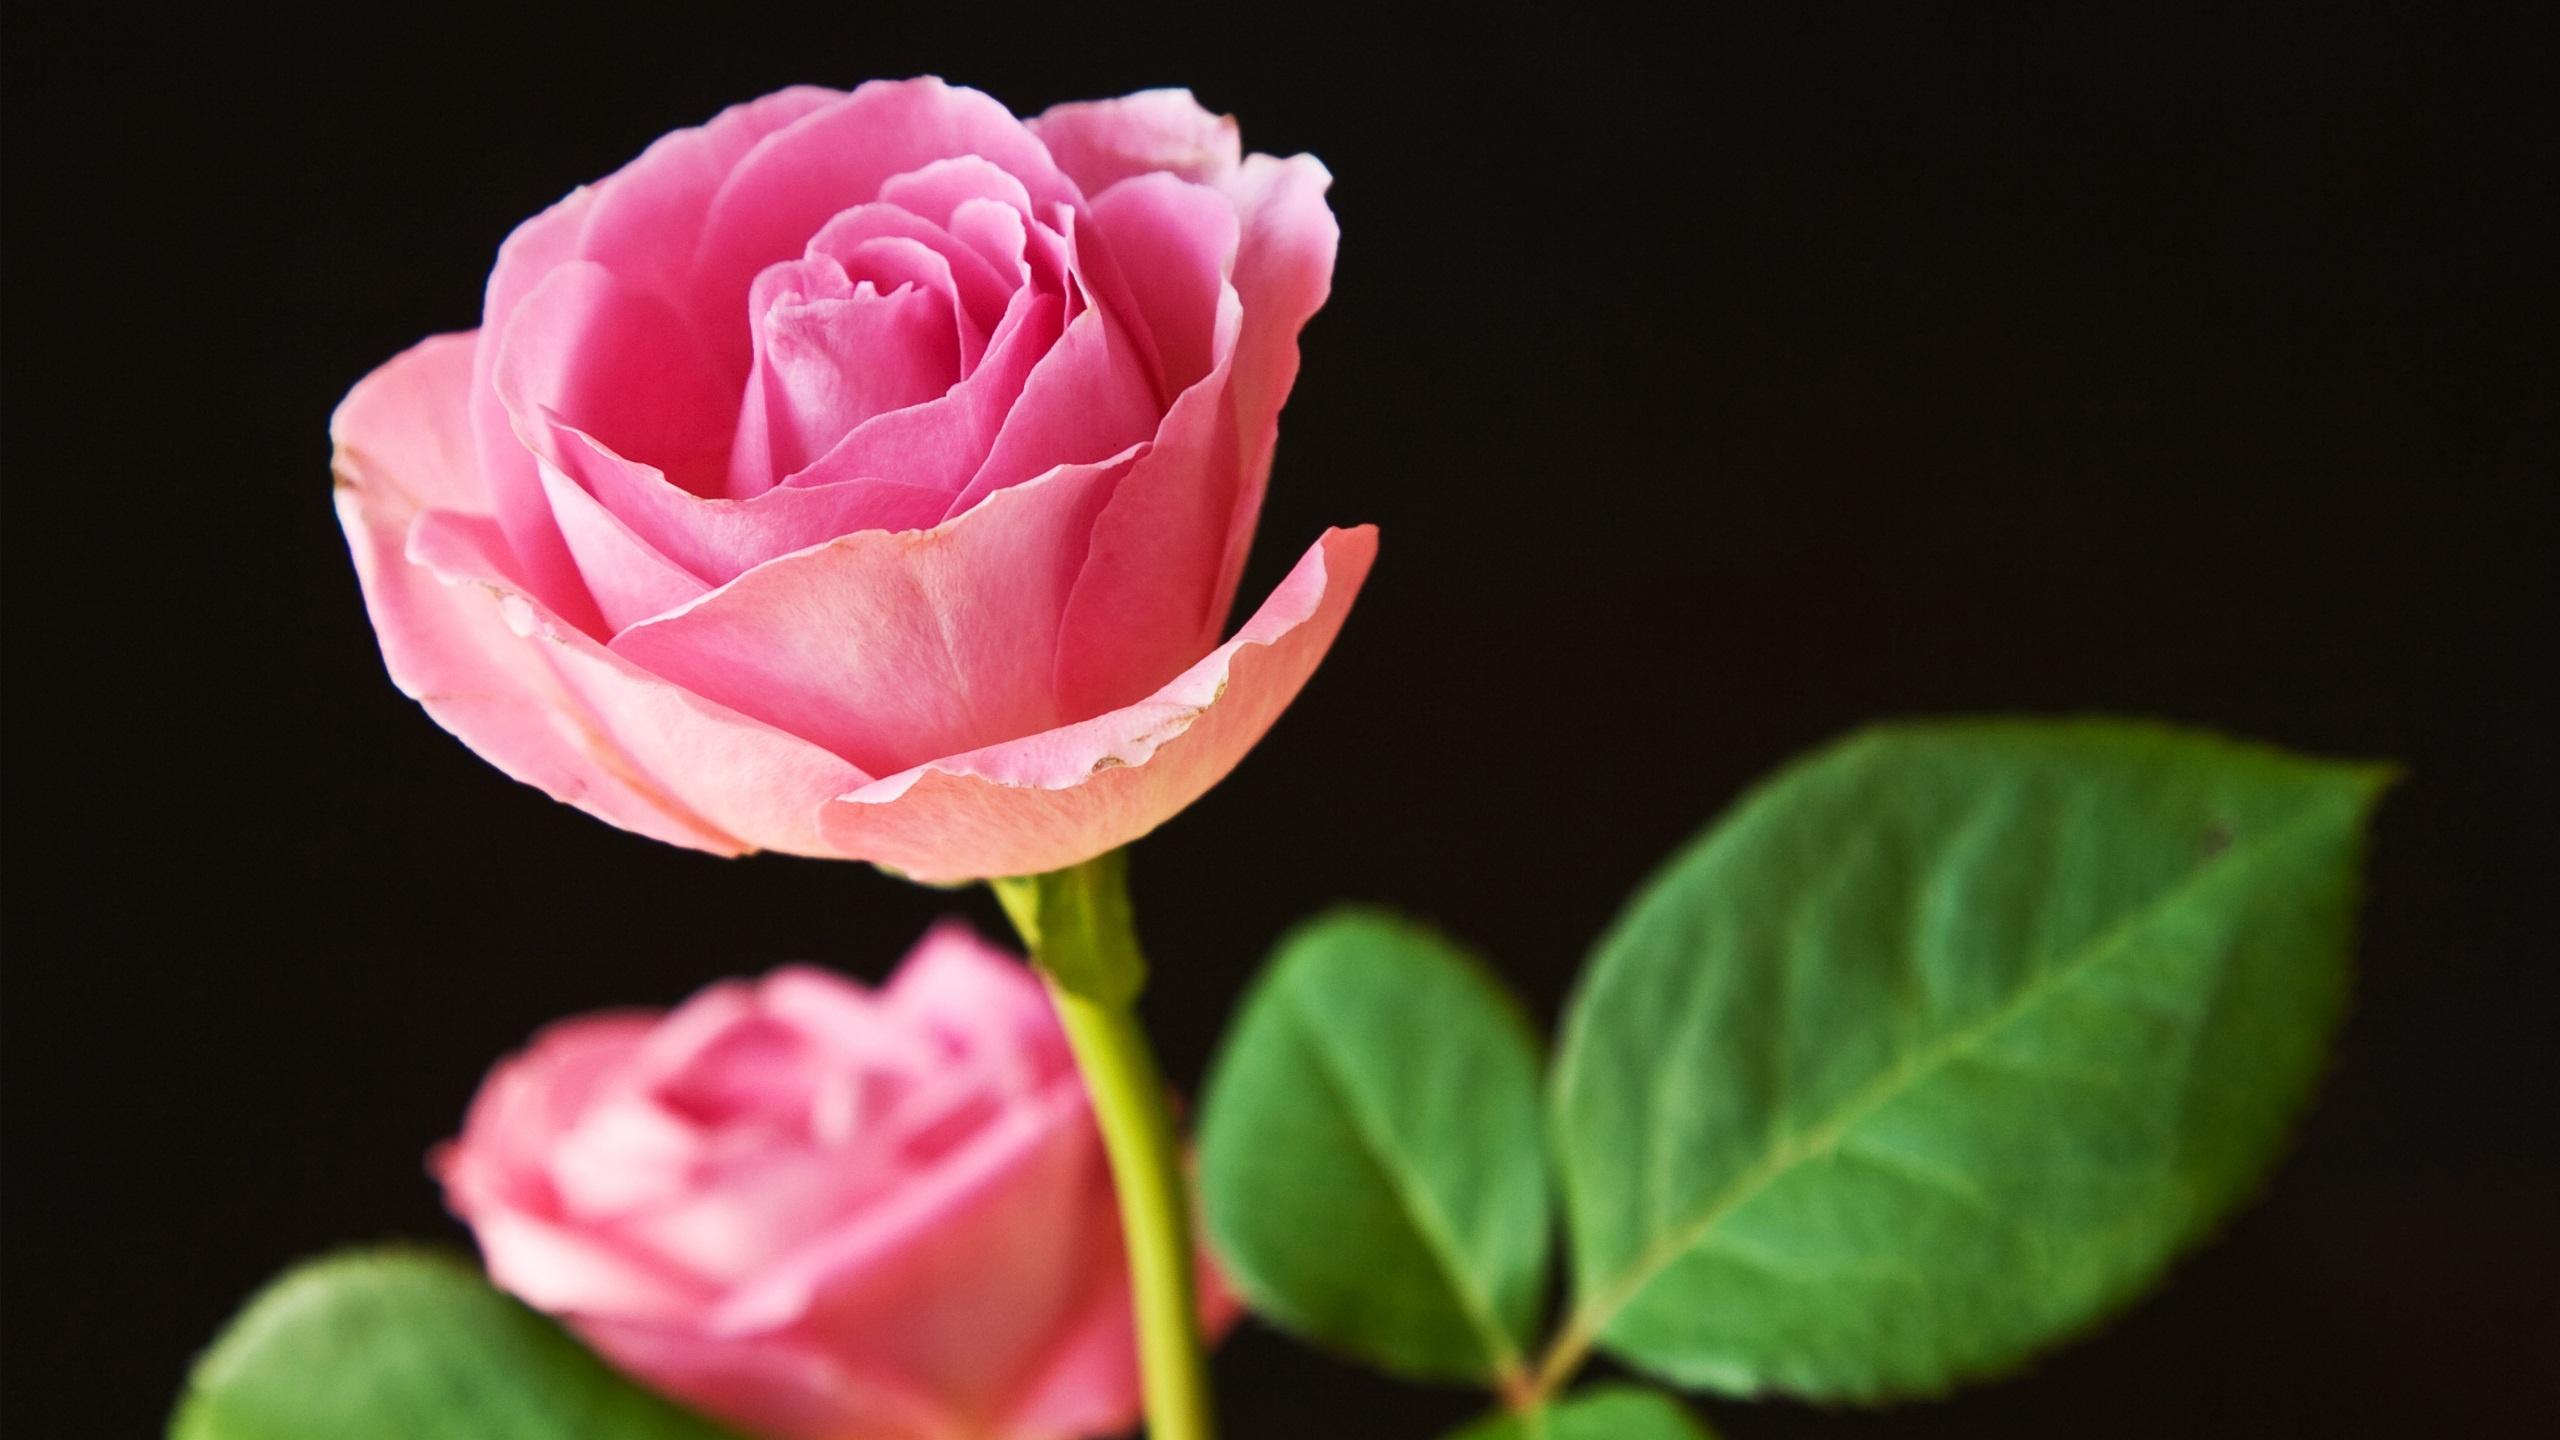 Desktop wallpaper flowers rose